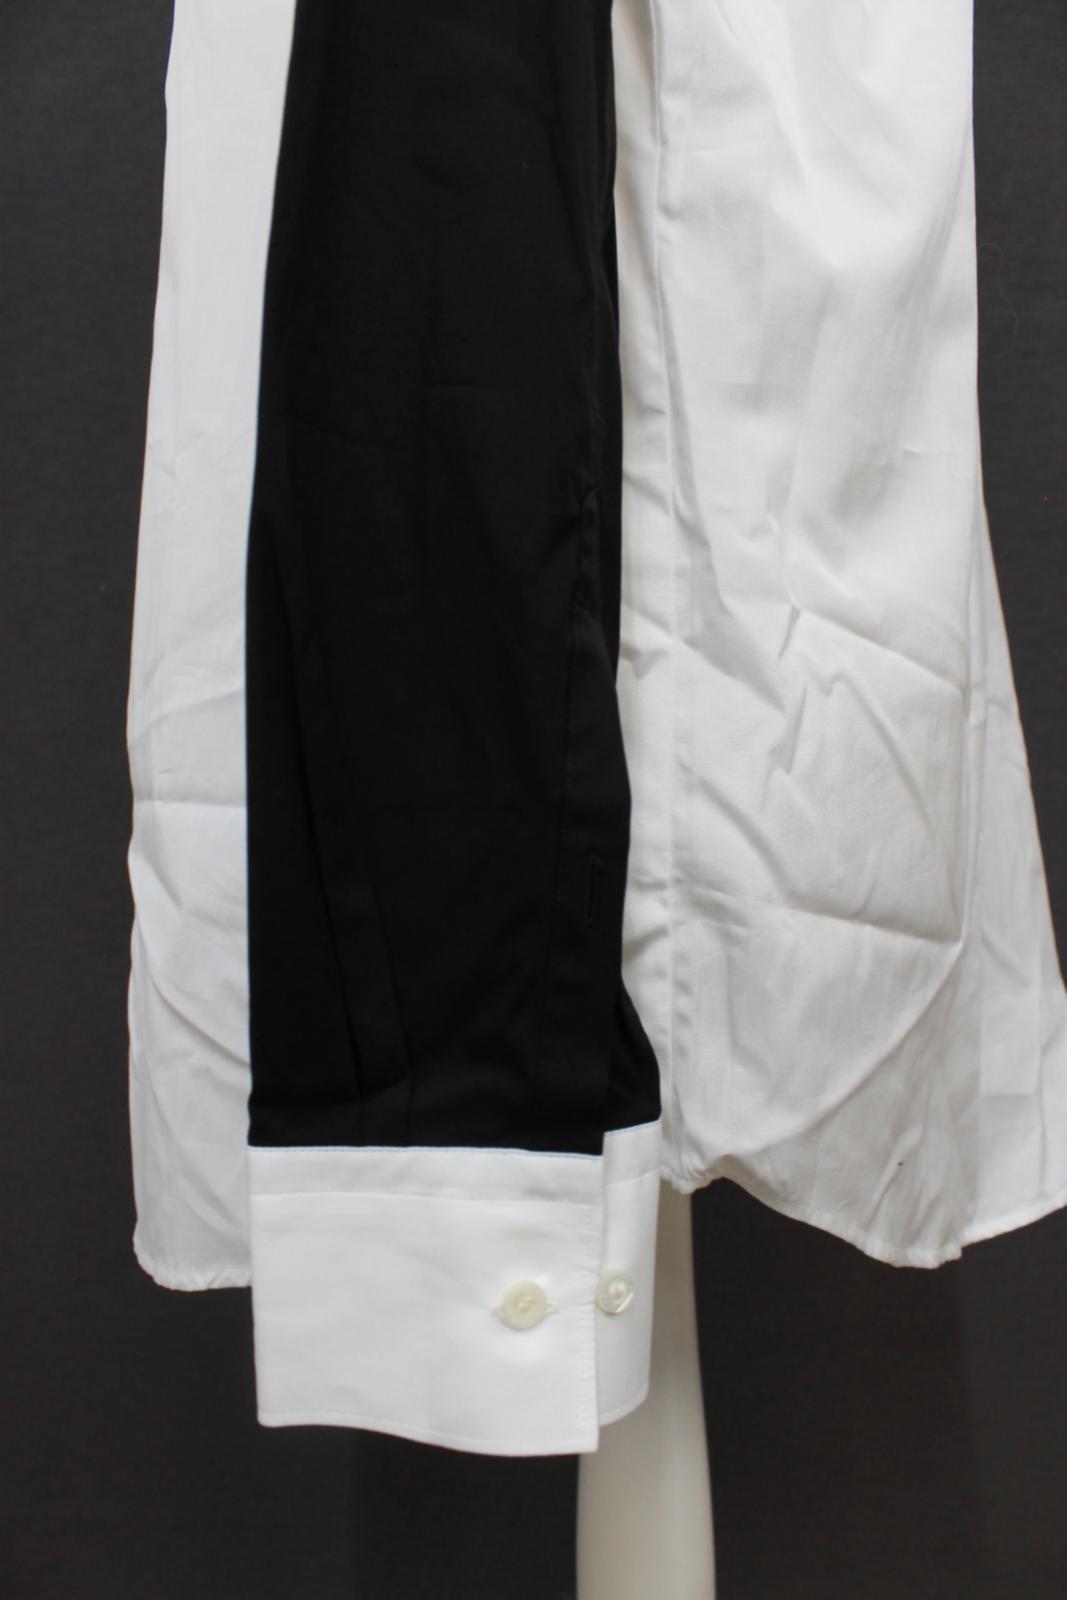 Neil-Barrett-Hombre-Blanco-De-Algodon-Manga-Negra-lo-que-el-F-Con-Cuello-Camisa-17-034 miniatura 7